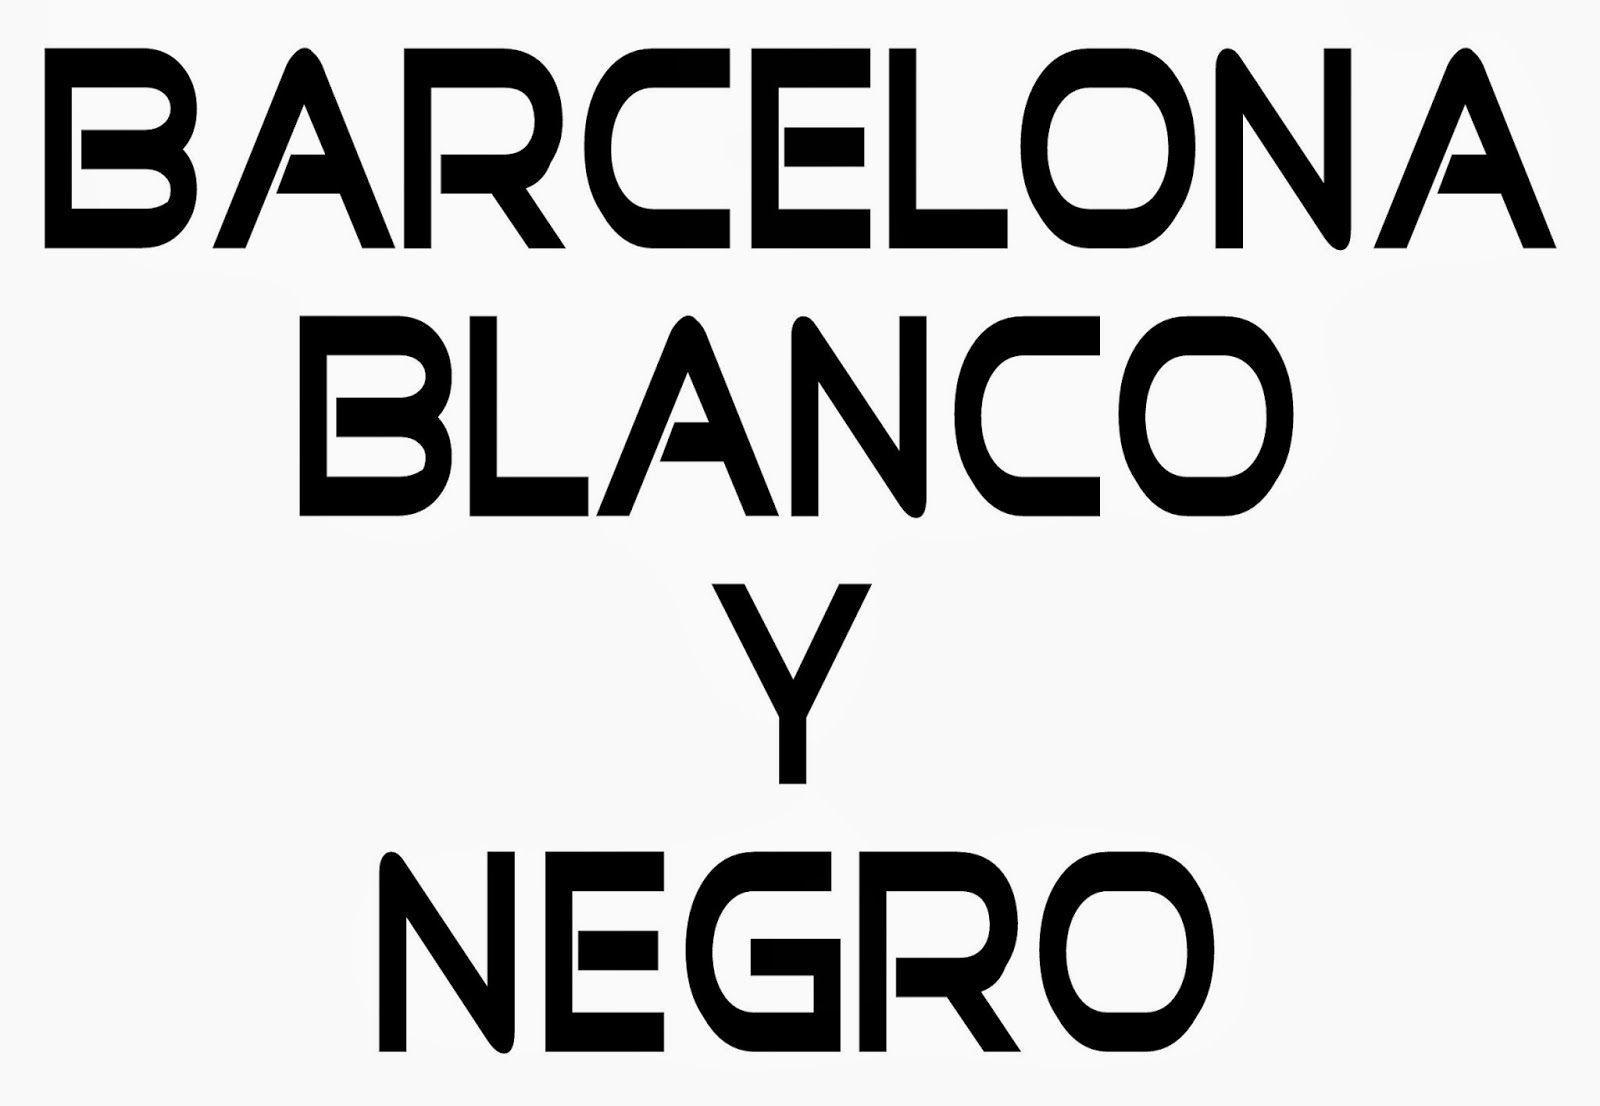 http://barcelonablancoynegro.blogspot.com.es/